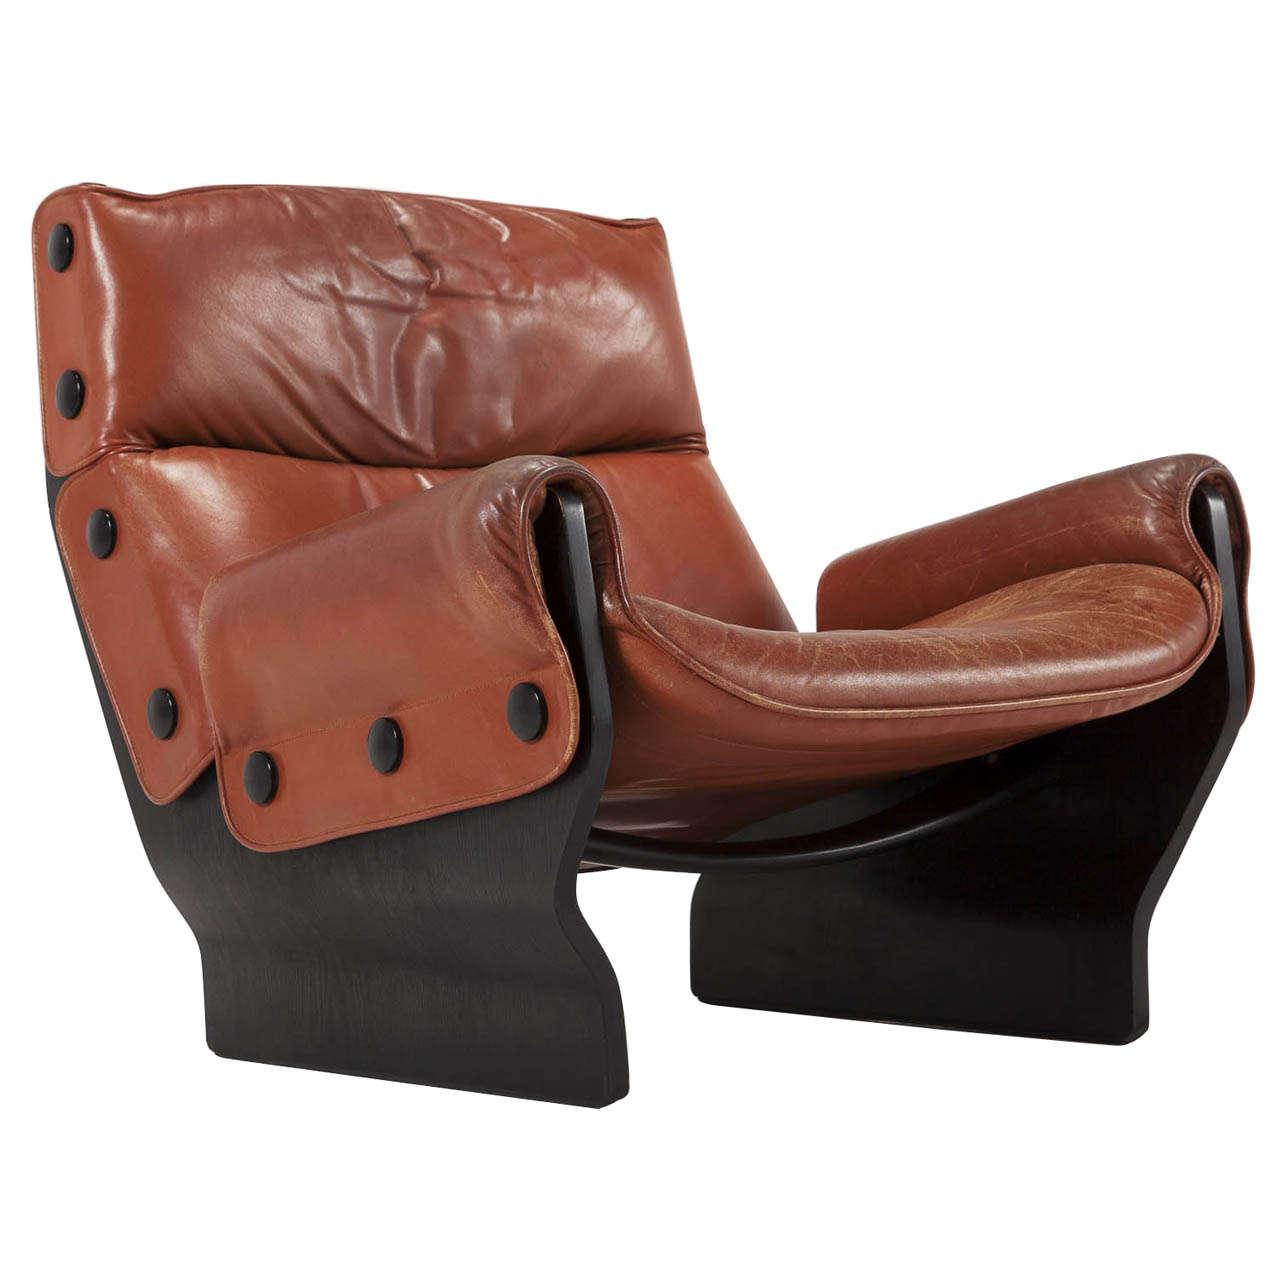 Osvaldo Borsani u0027Canadau0027 Lounge Chair in Original Cognac Leather 1  sc 1 st  1stDibs & Osvaldo Borsani u0027Canadau0027 Lounge Chair in Original Cognac Leather ... islam-shia.org